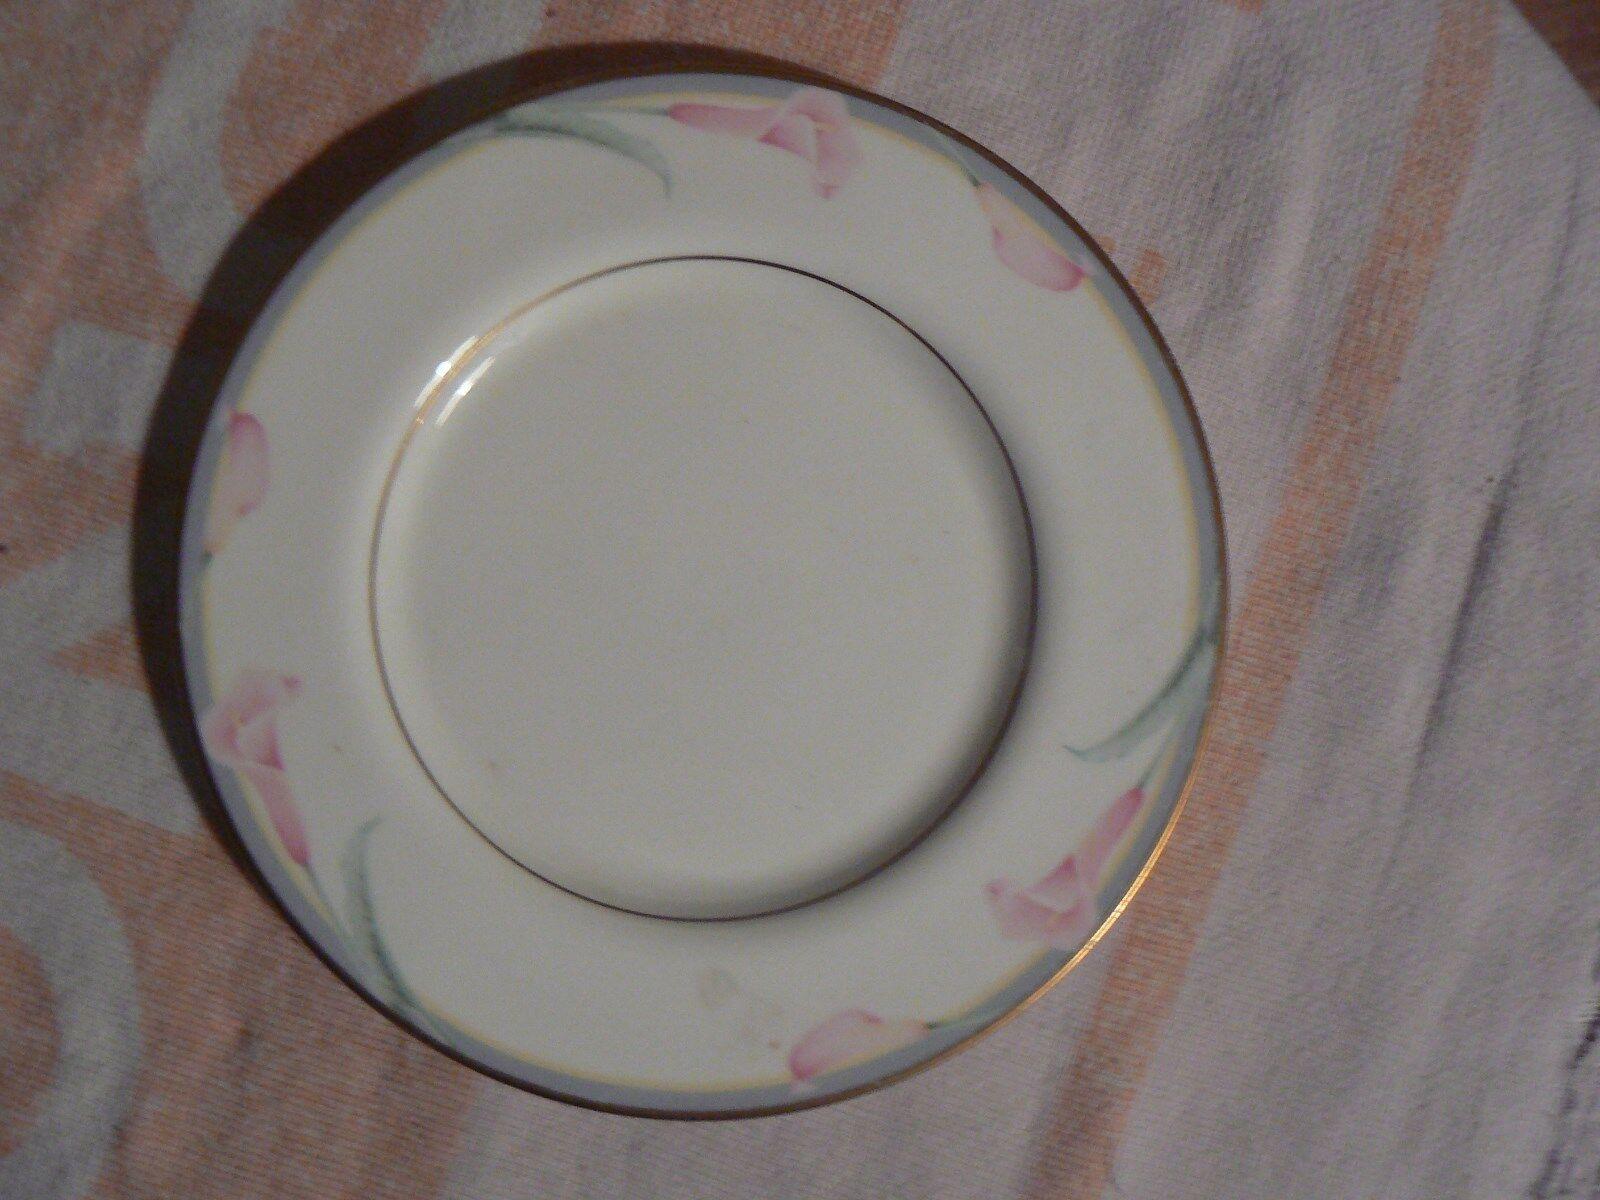 Oscar De La Renta bread plate (Mademoiselle) 8 available - $4.90